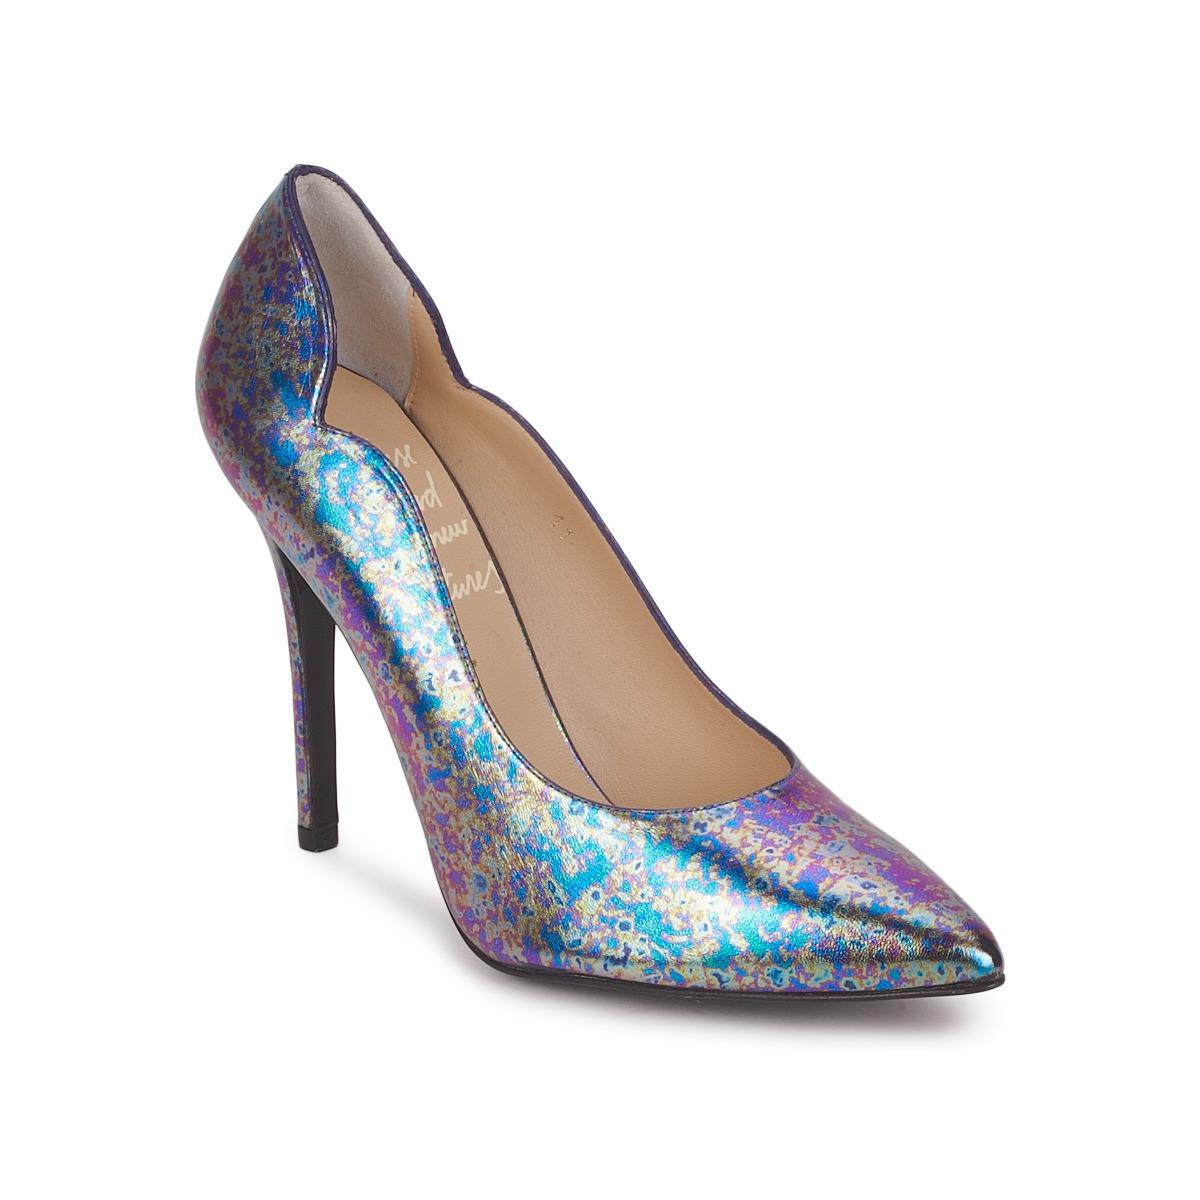 453e844bf7 Minna Parikka Hile Women s Court Shoes In Multicolour in Blue - Lyst